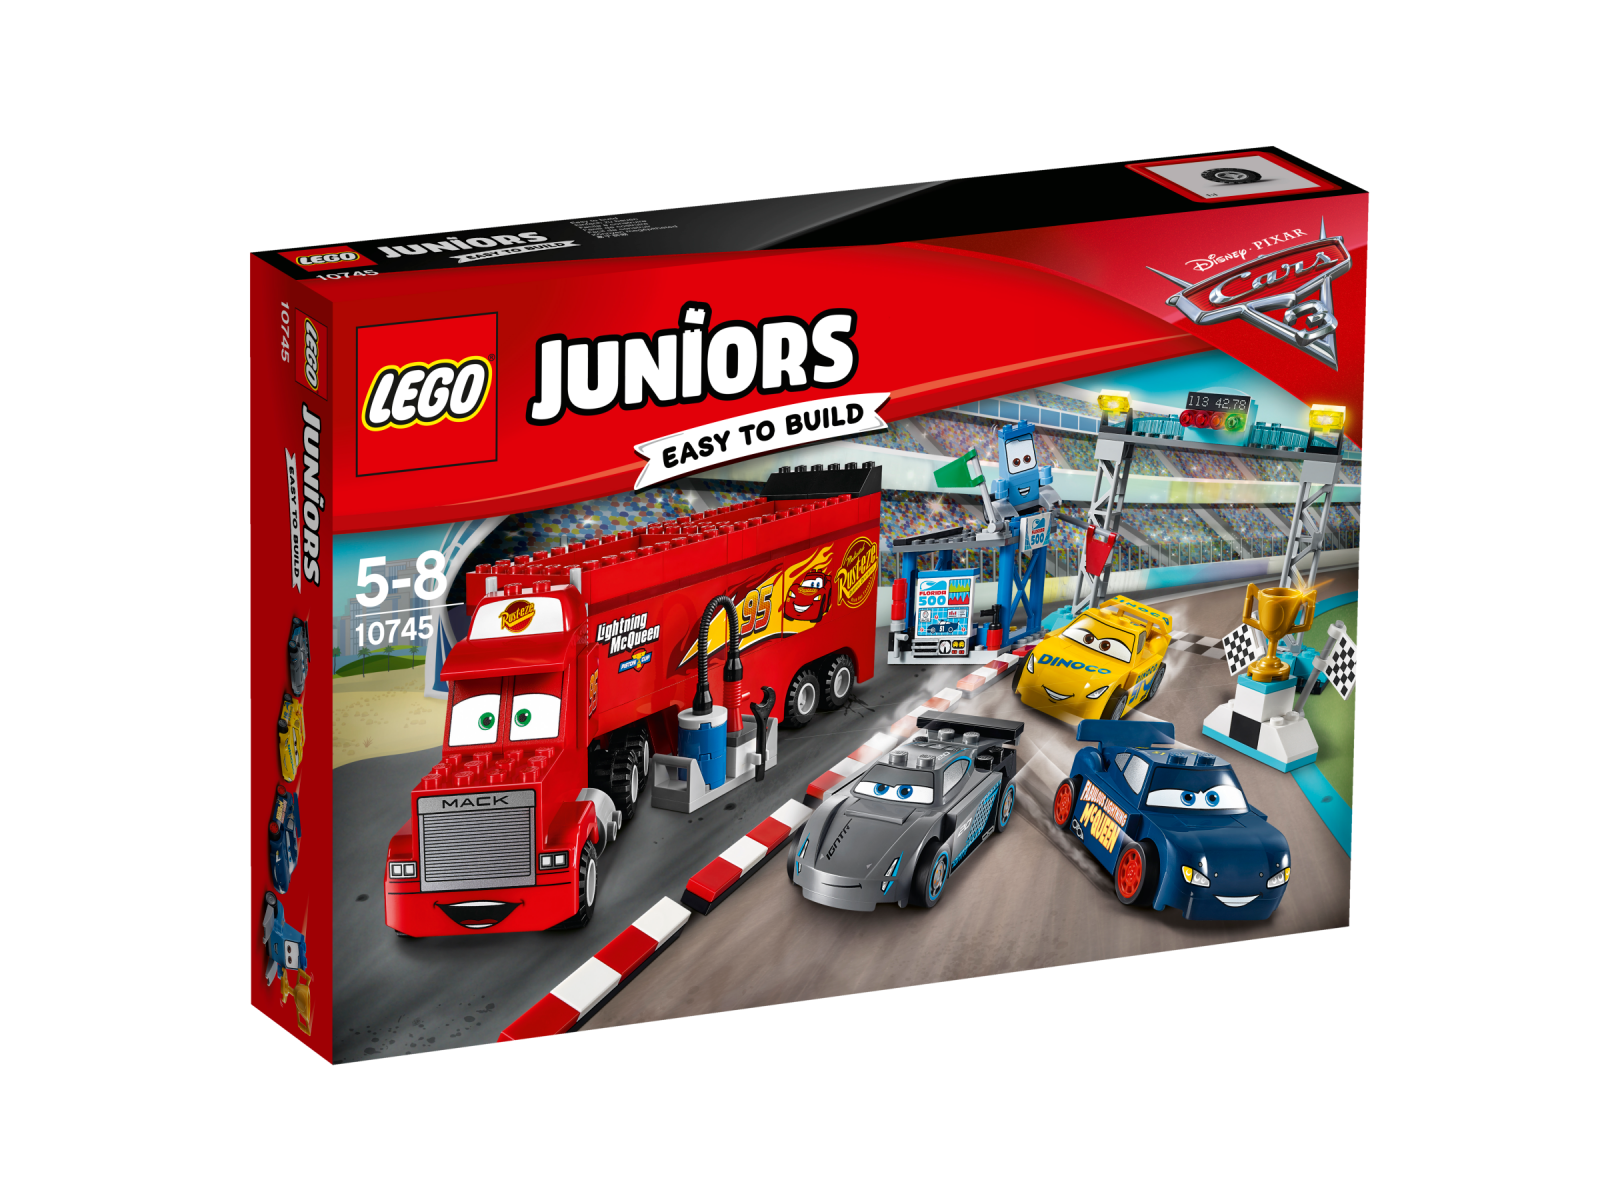 LEGO® Juniors 10745 Finale Florida 500 NEU OVP_ Florida 500 Final Race NEW MISB  | Stil